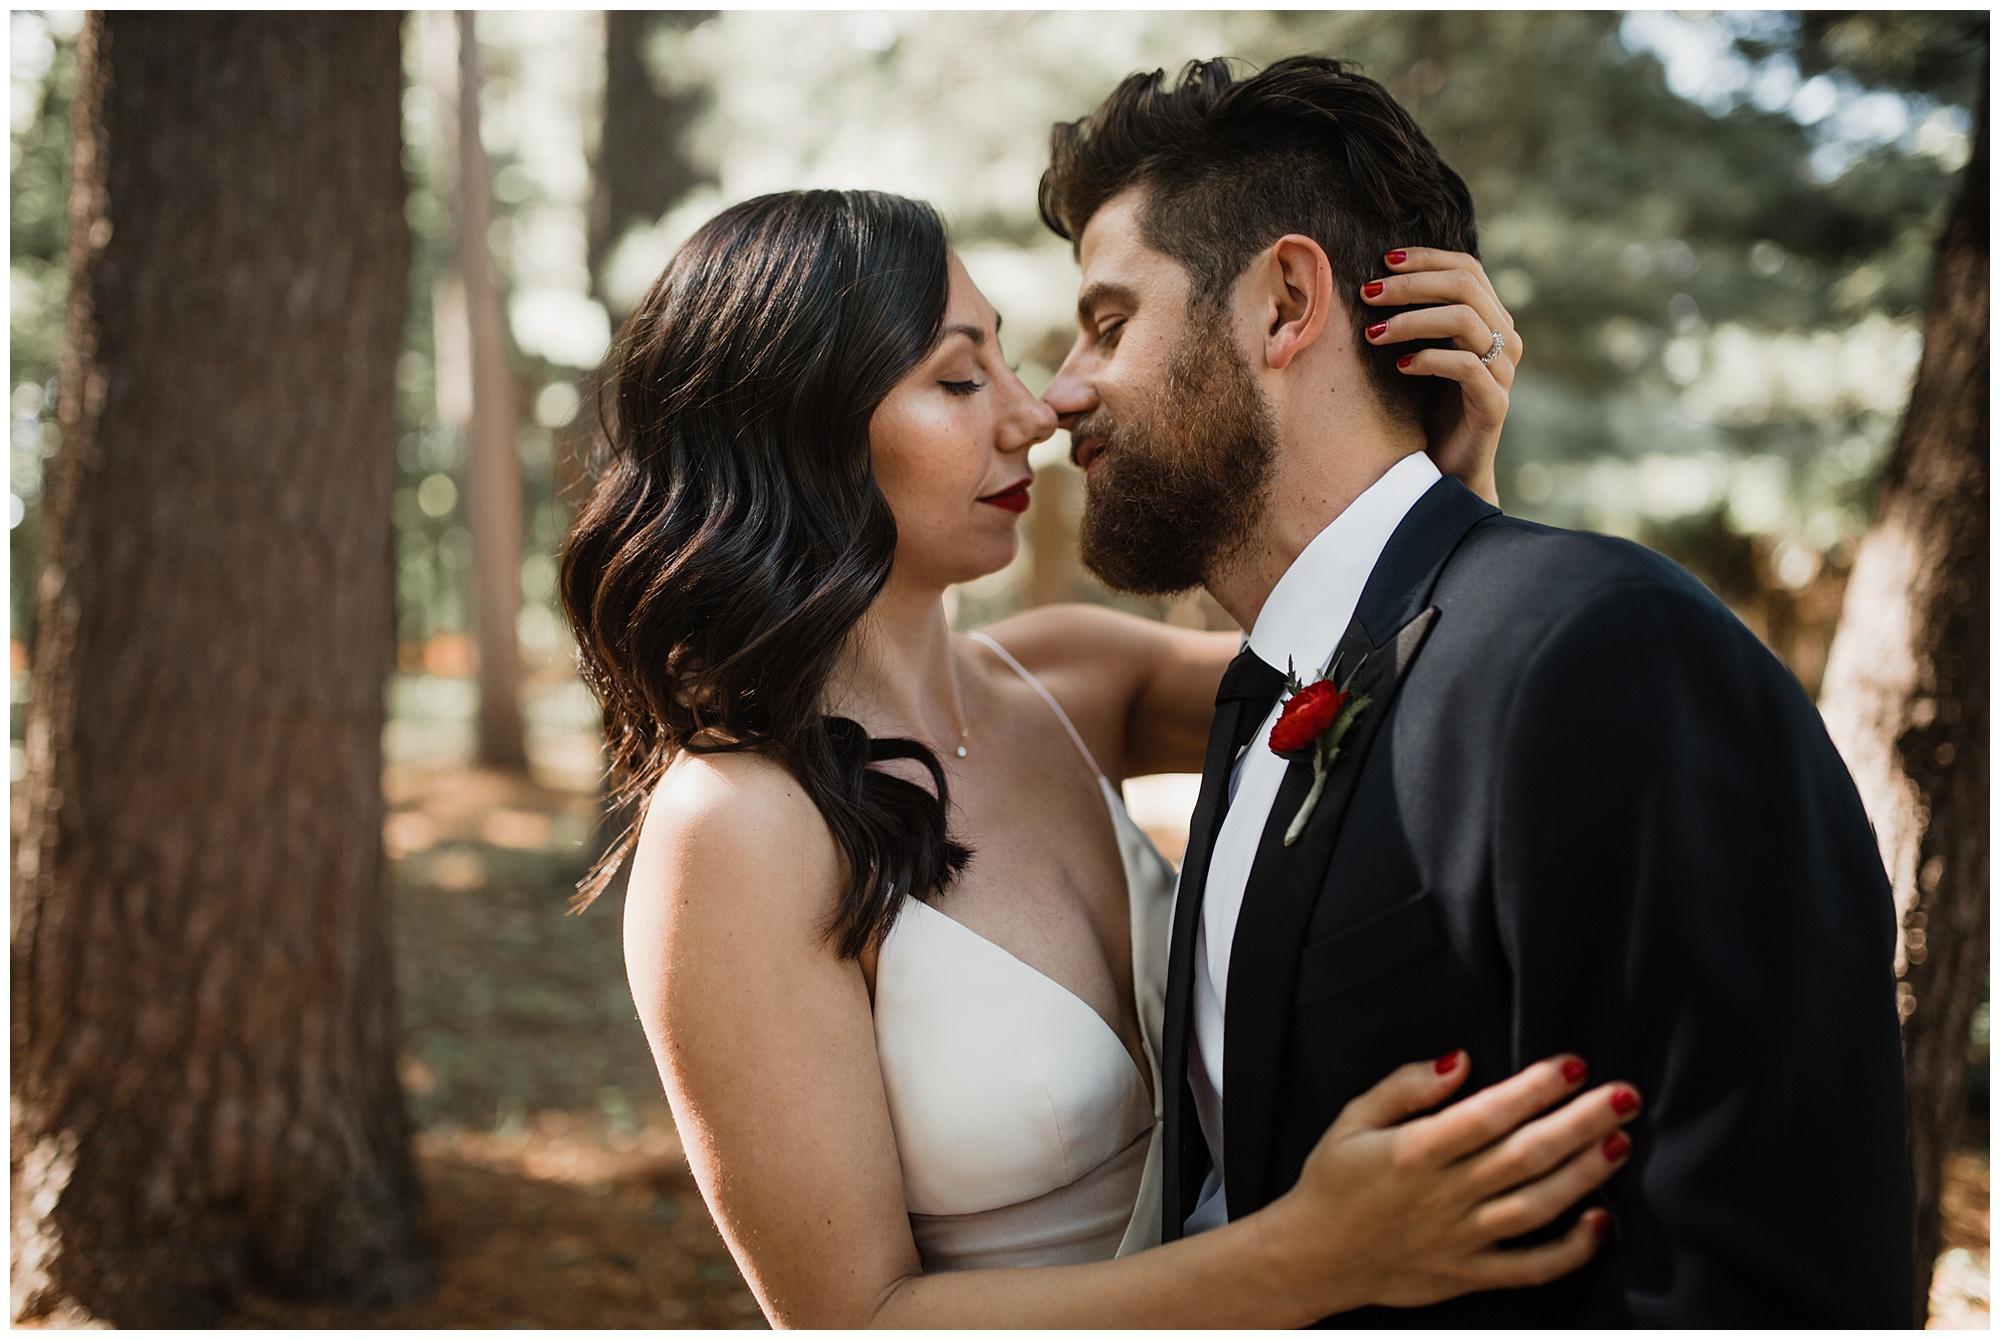 allerton_park_wedding_champaign_il_chicago_wright_photographs_ne_0083.jpg